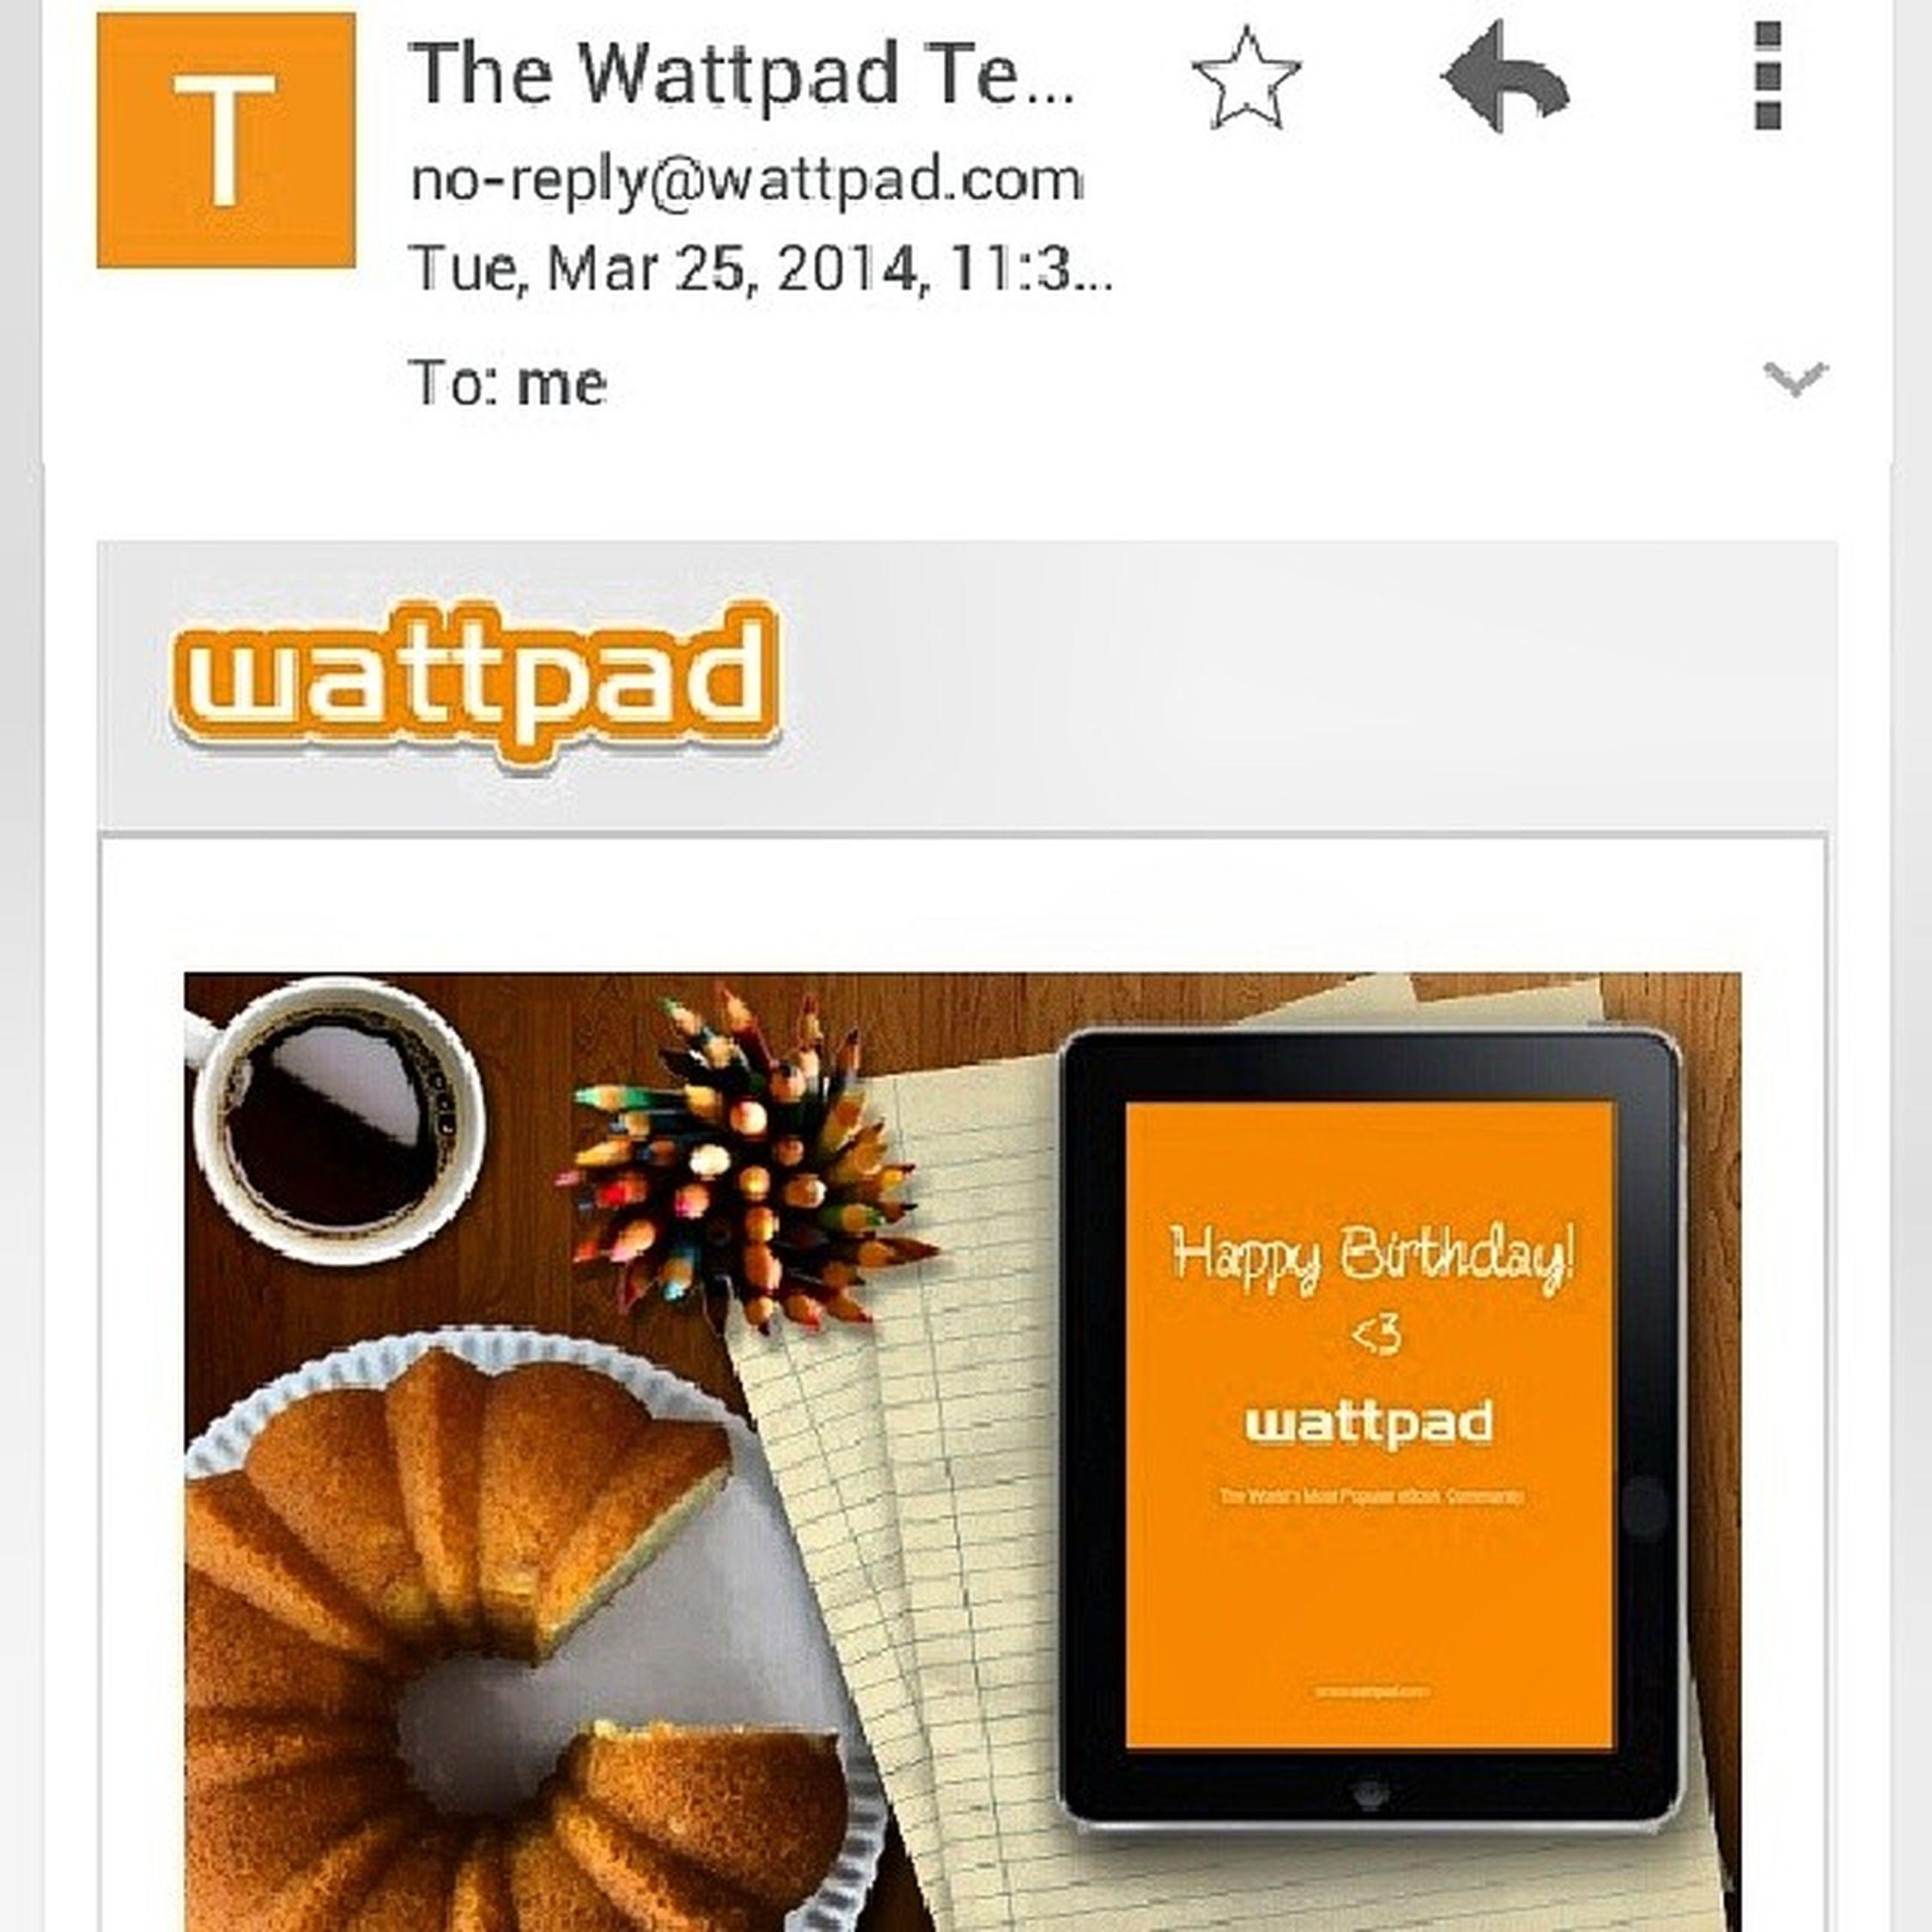 Even wattpad wished me on my sixteenth 24March 2014 Sixteenth Birthday